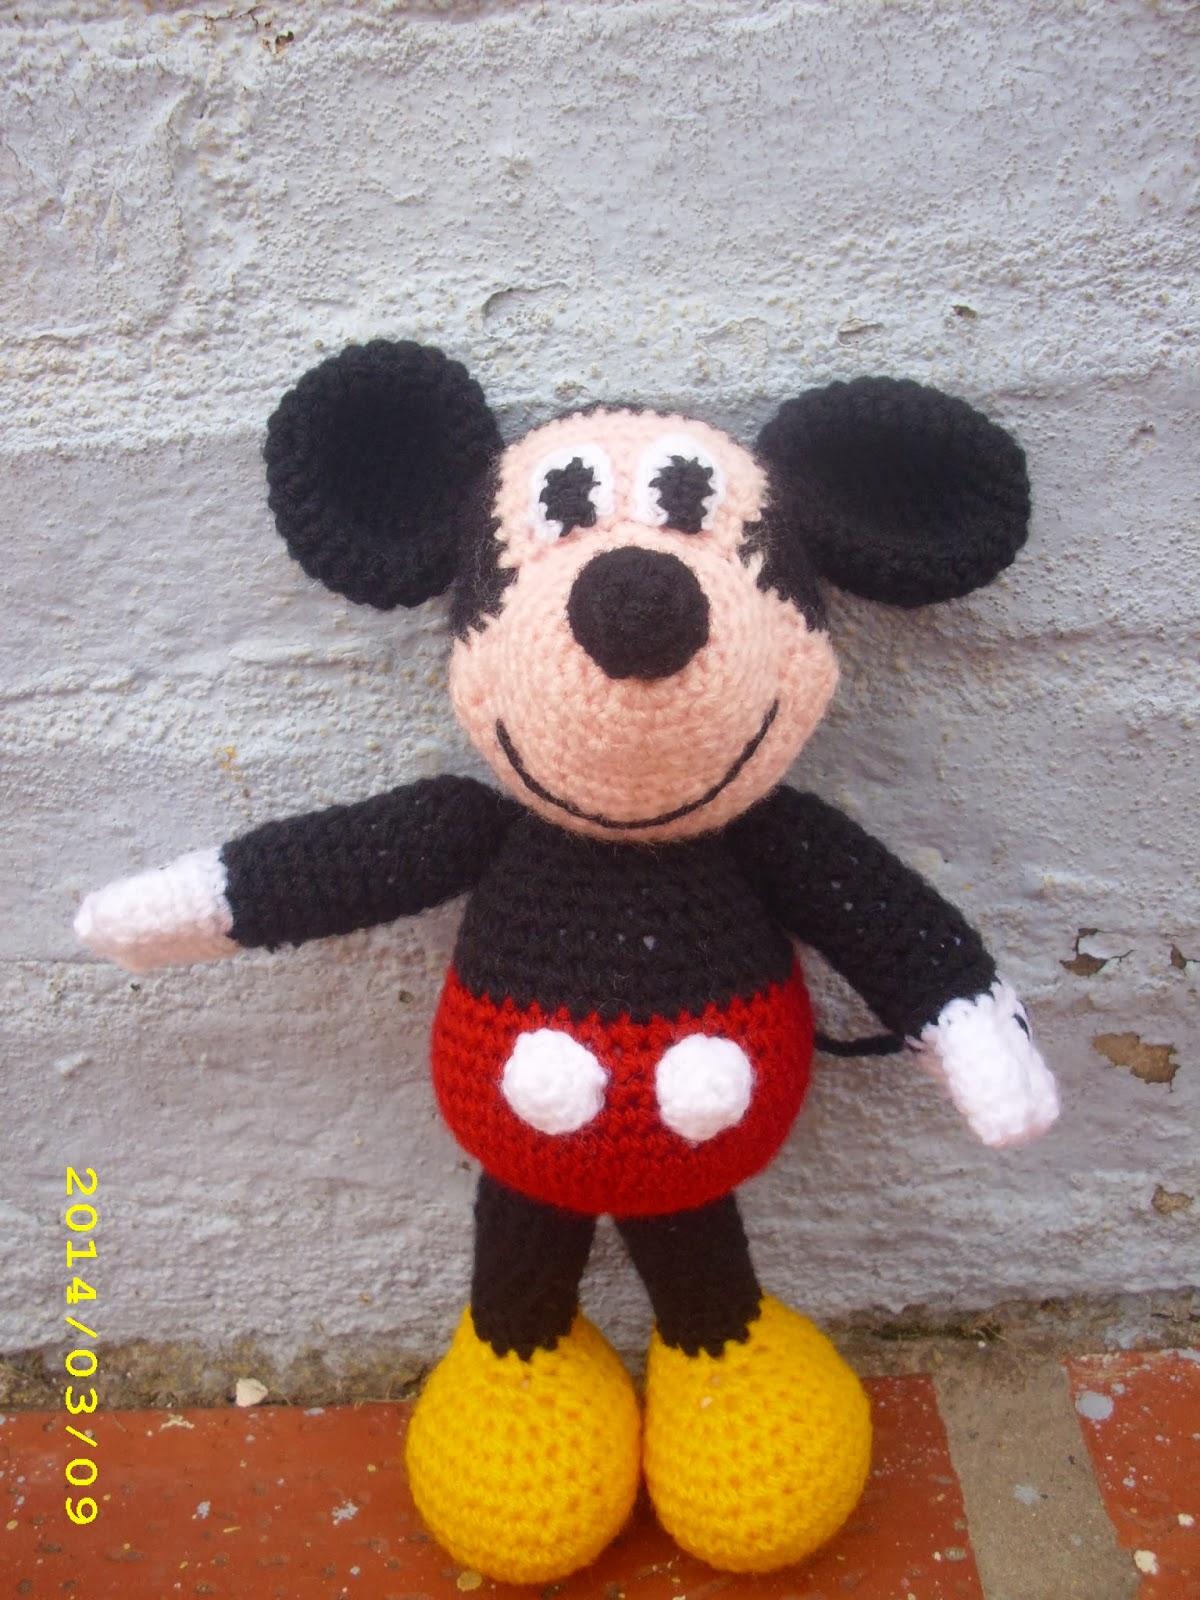 Patron Mickey Mouse Amigurumi Gratis : Patron gratis amigurumi Mickey Mouse - Imagui